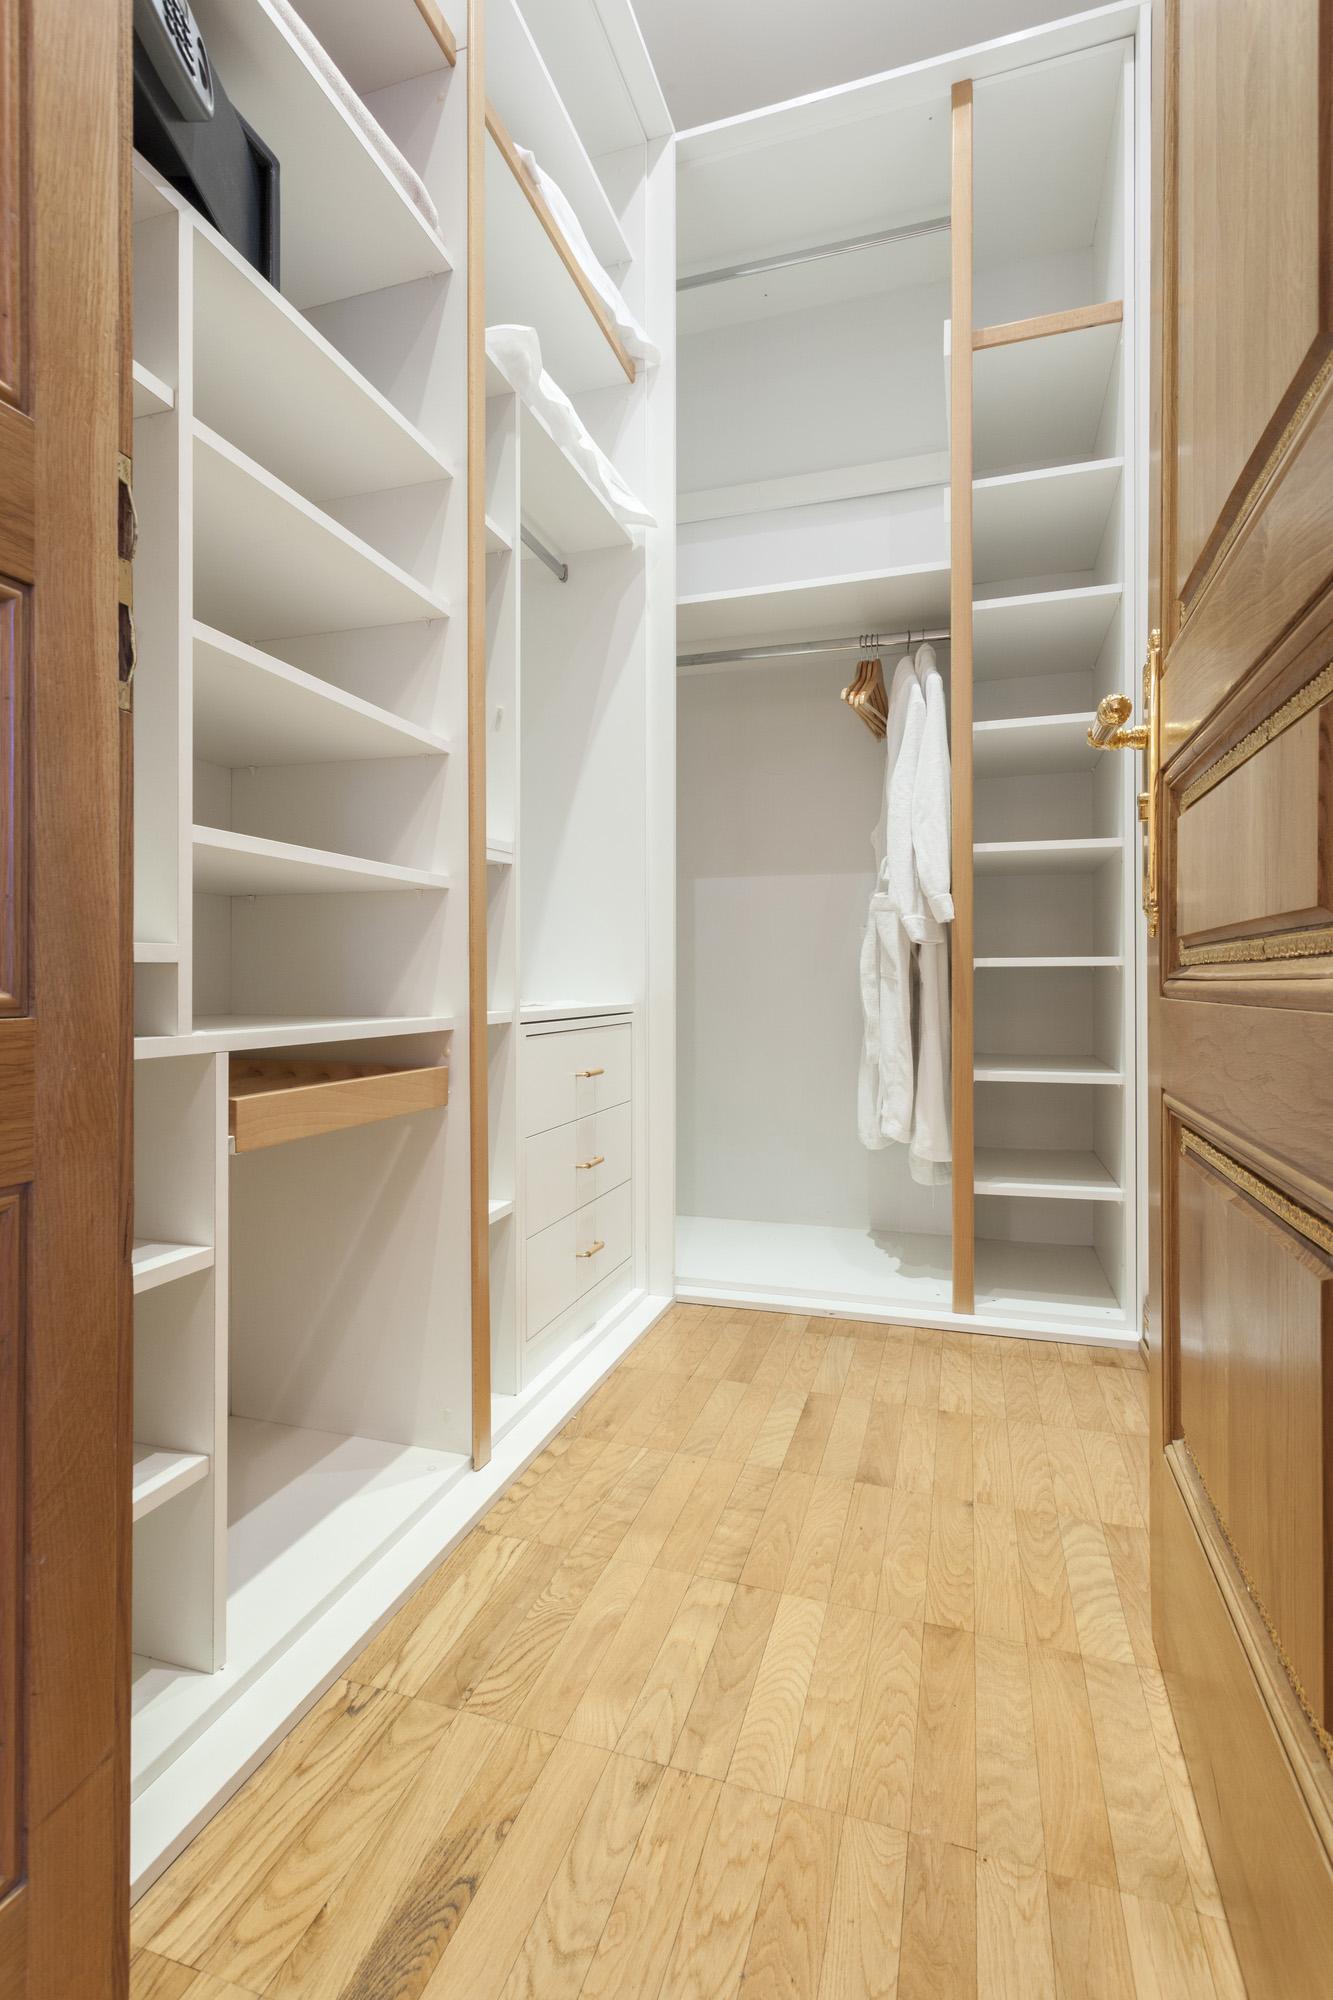 walk in wardrobe ideas, bespoke storage solutions, custom wardrobe